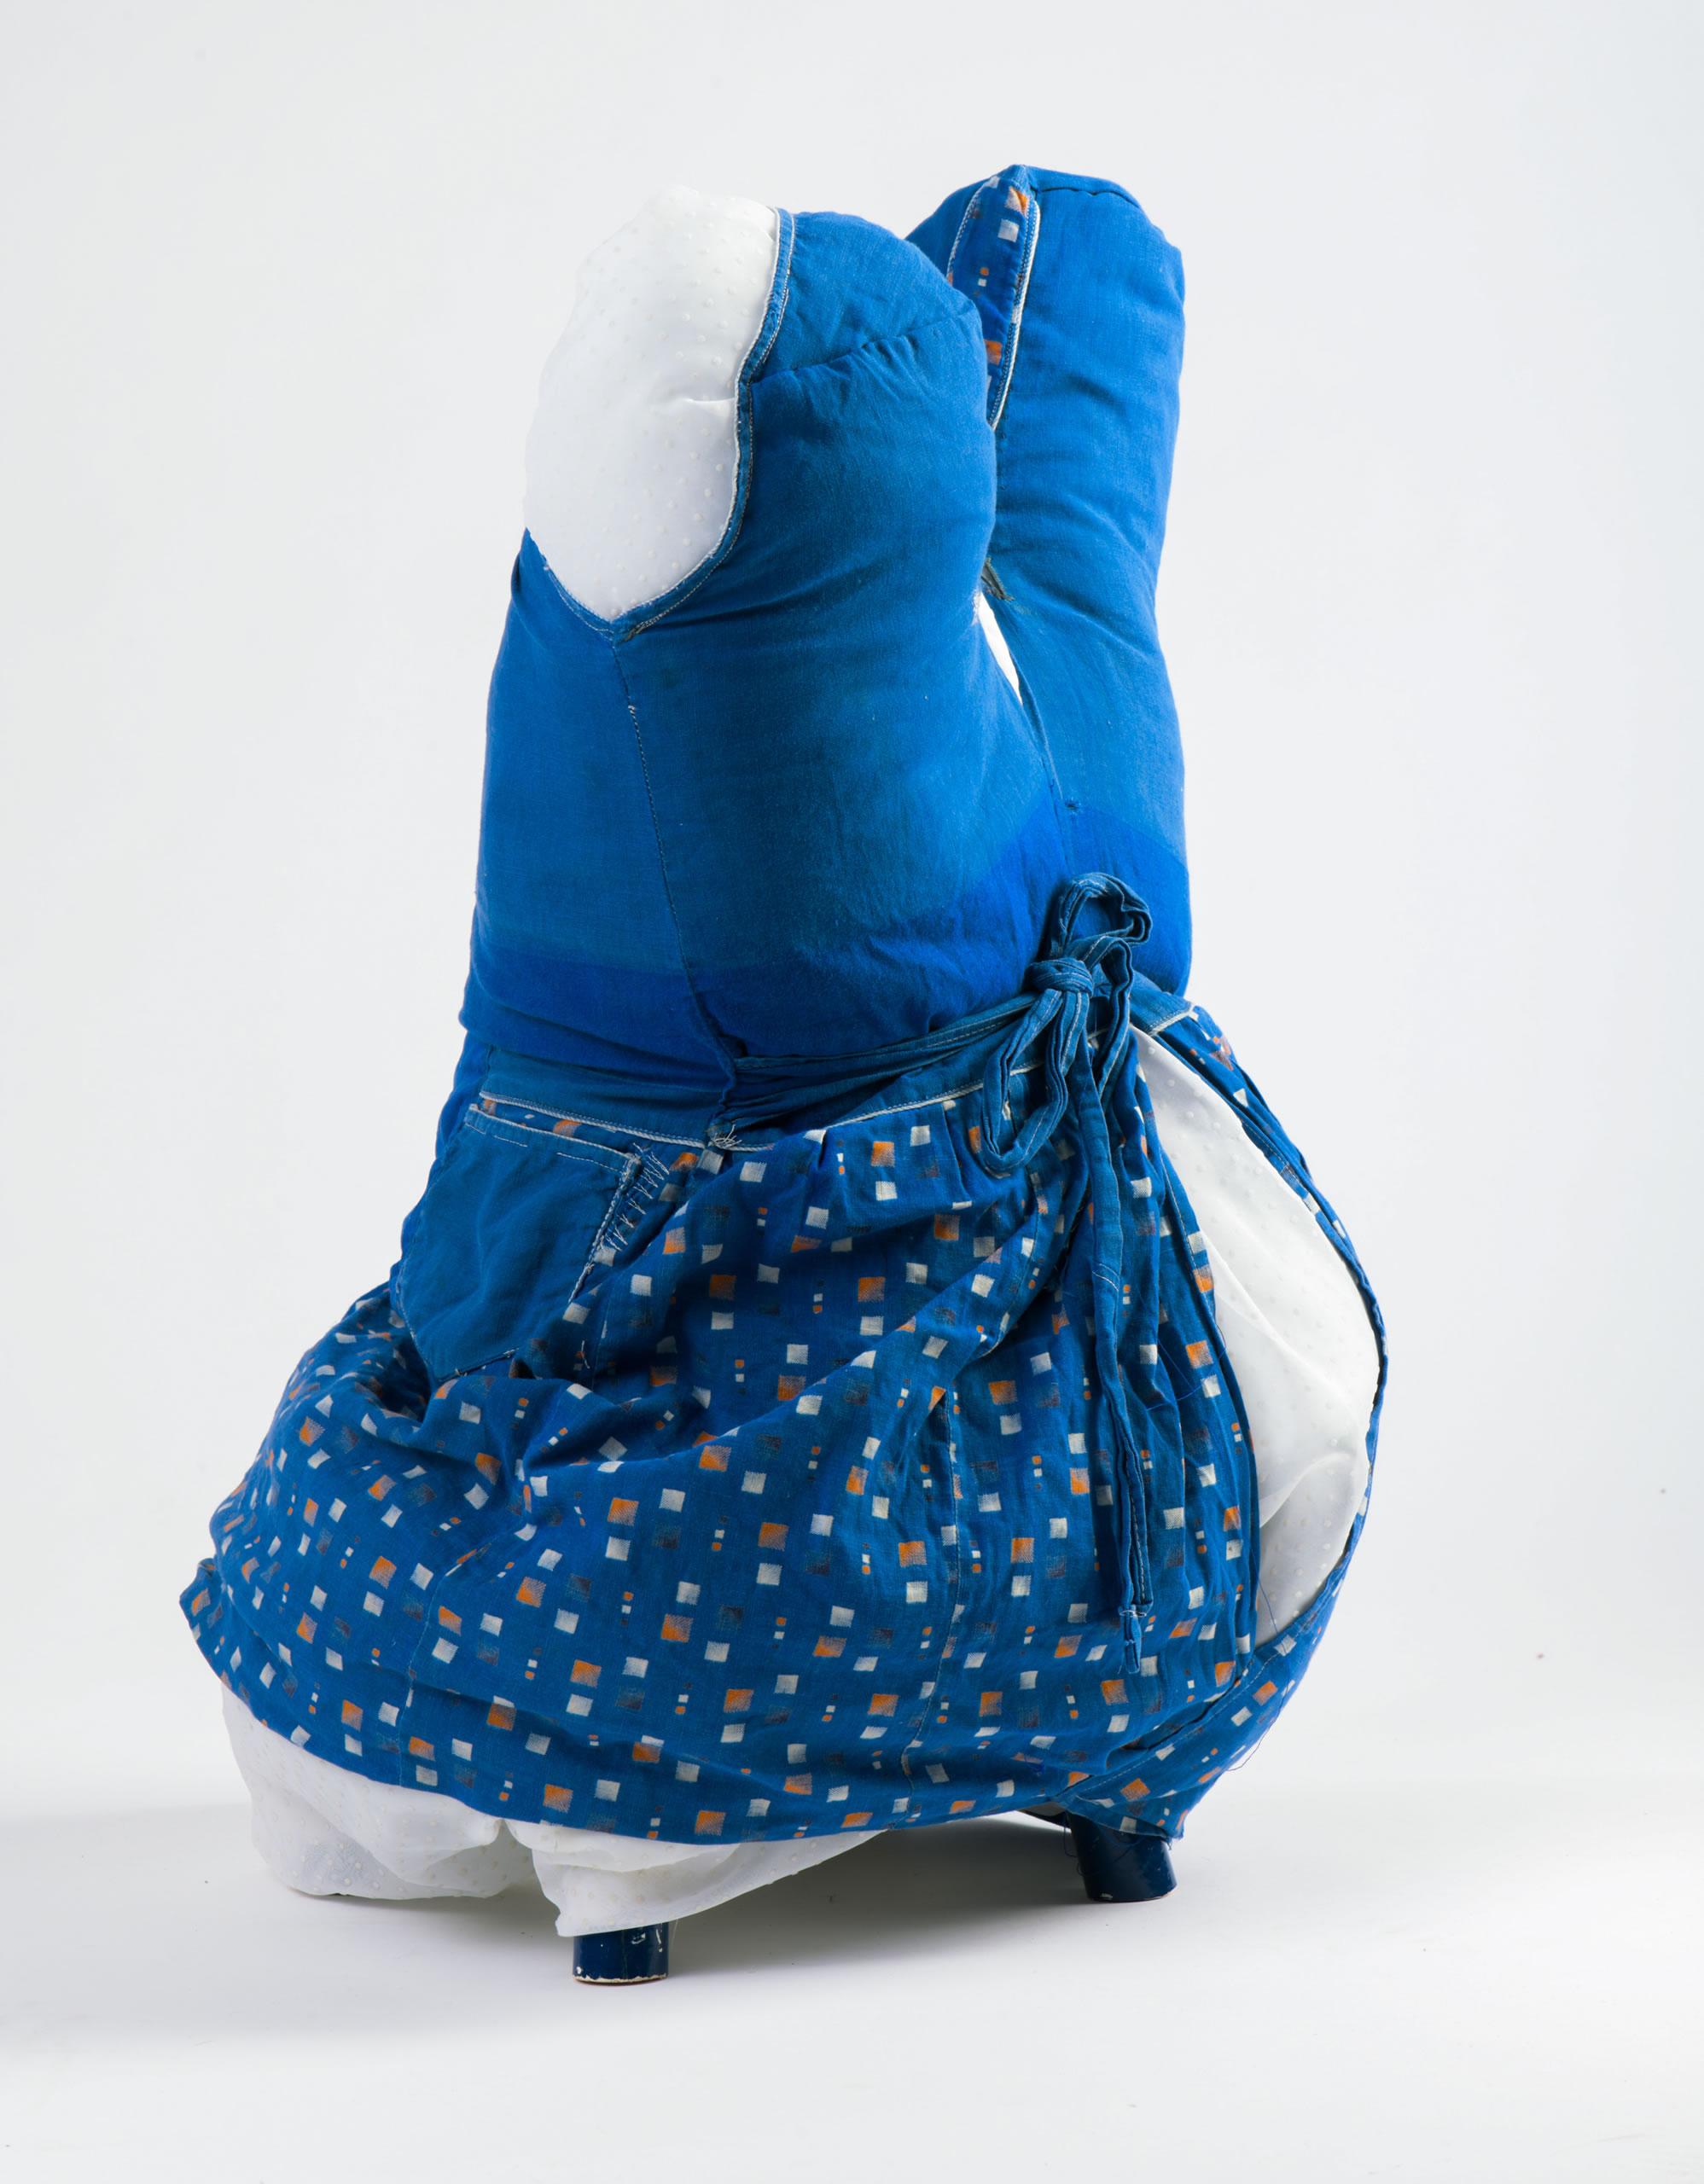 Andrea Vilhena | Still 2019 | Textil | 62 x 37 x 43 cm | Foto Neumüller | Galerie3